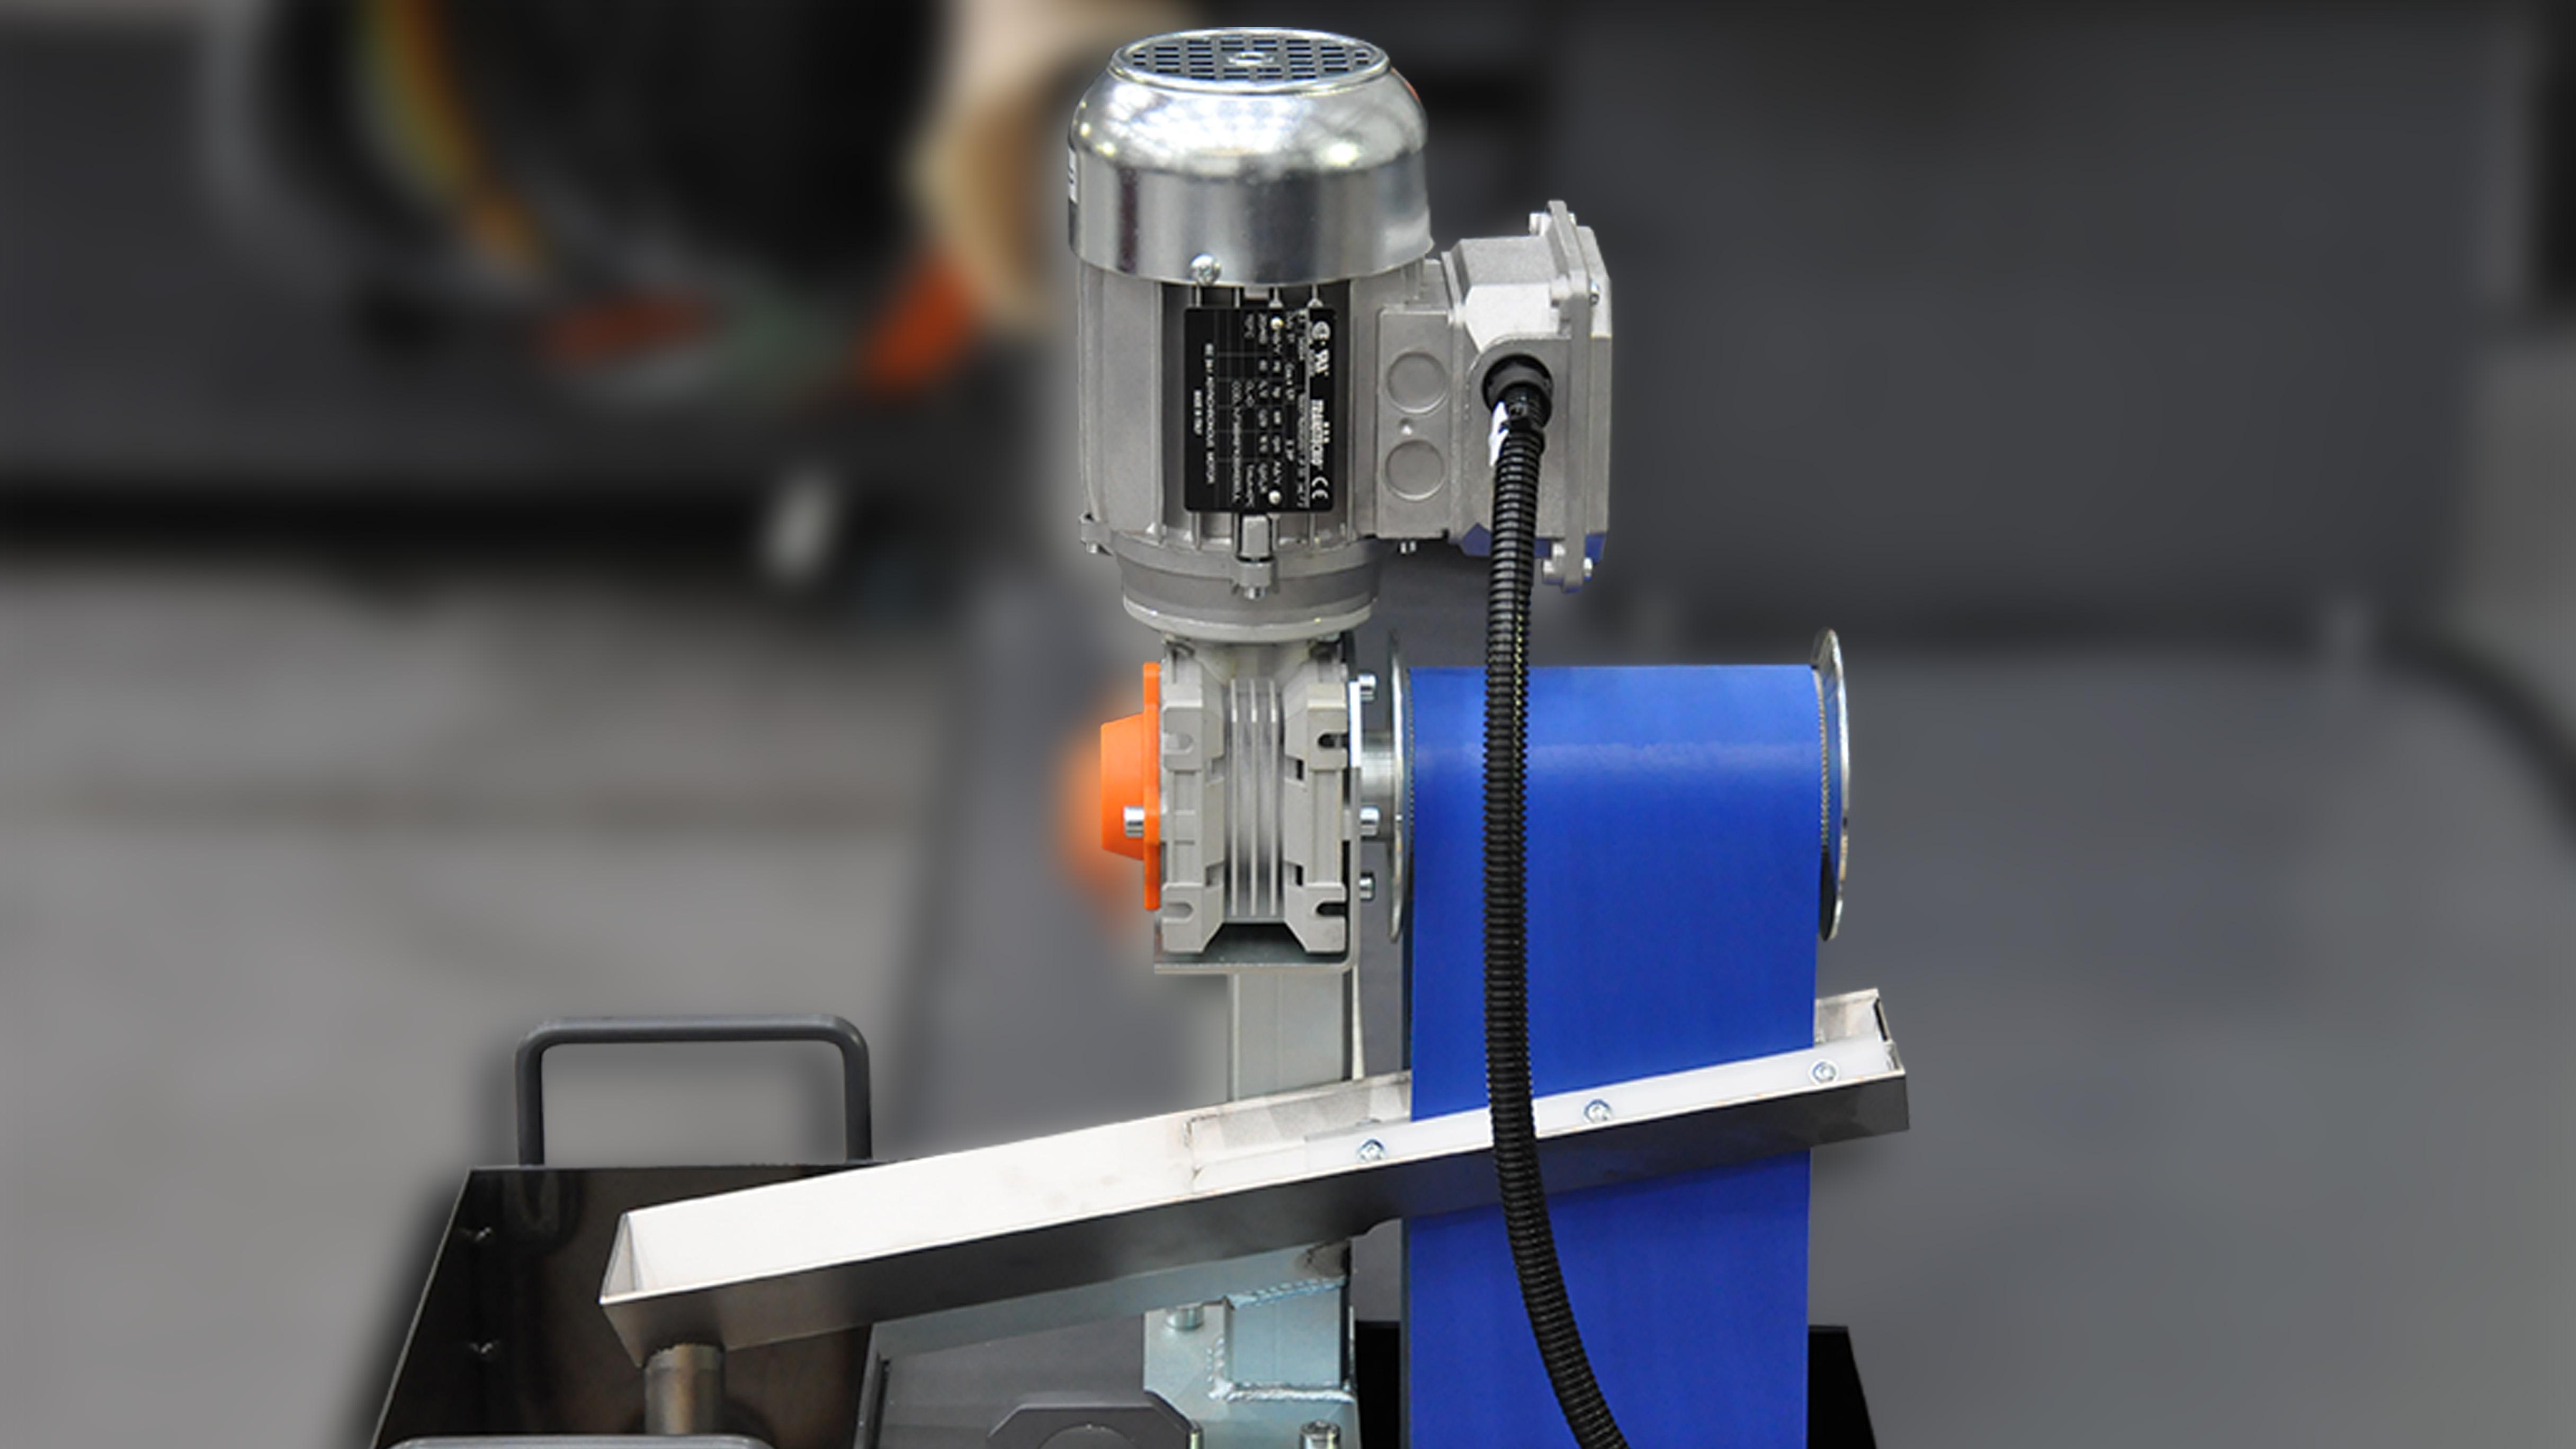 Kühlmittelanlage mit Rückspülfilter - Image2